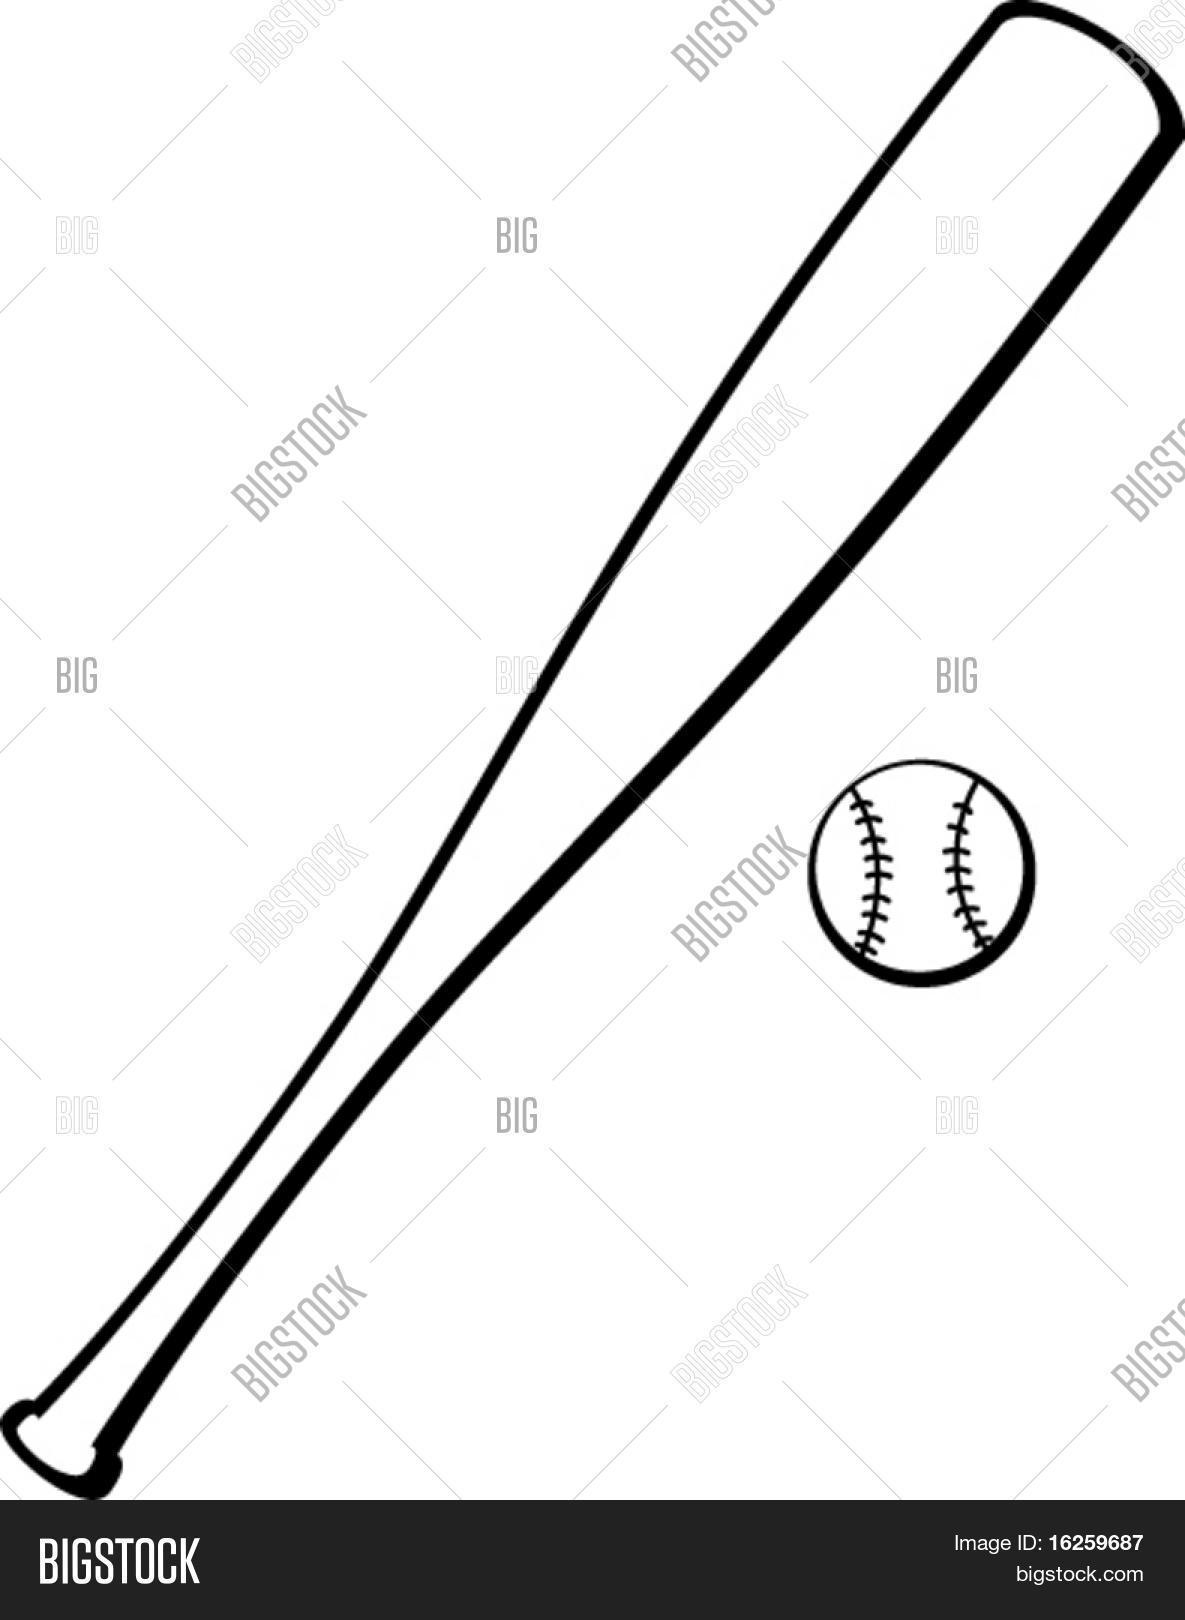 baseball bat and ball Stock Vector & Stock Photos | Bigstock